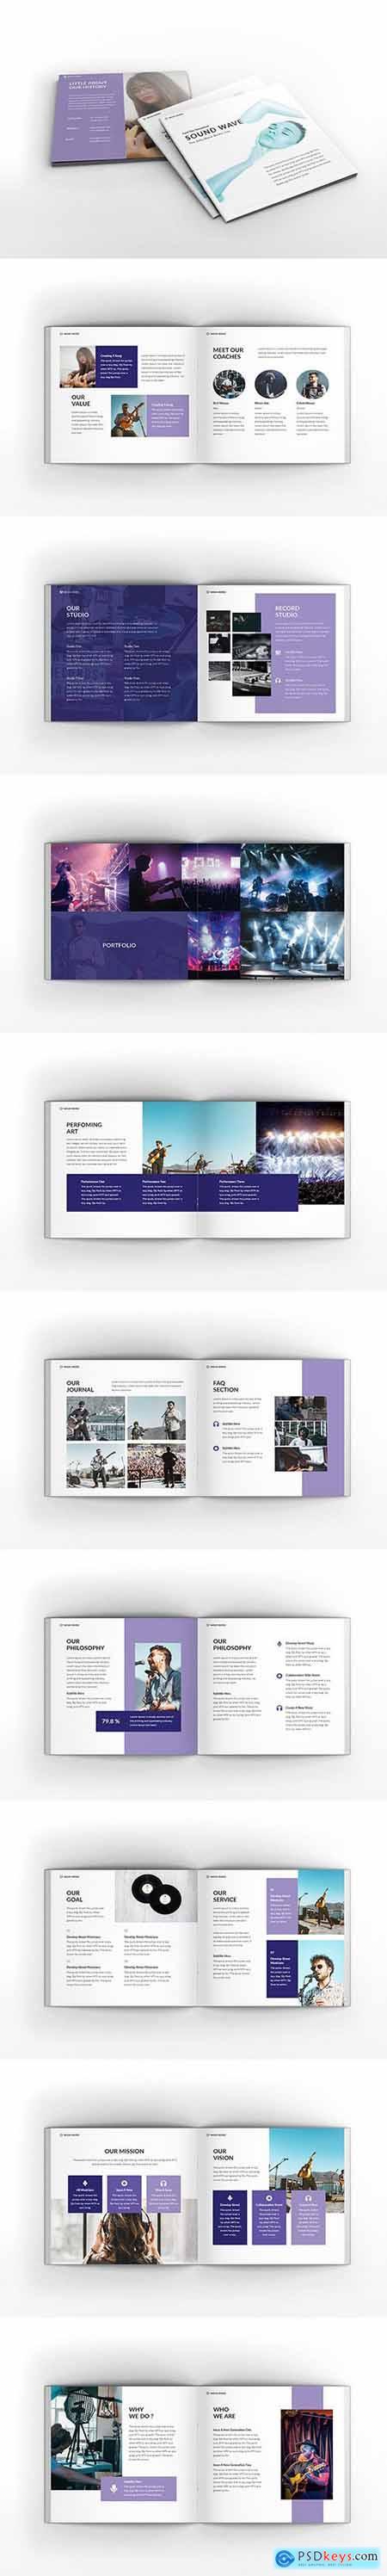 Music Square Brochure Template